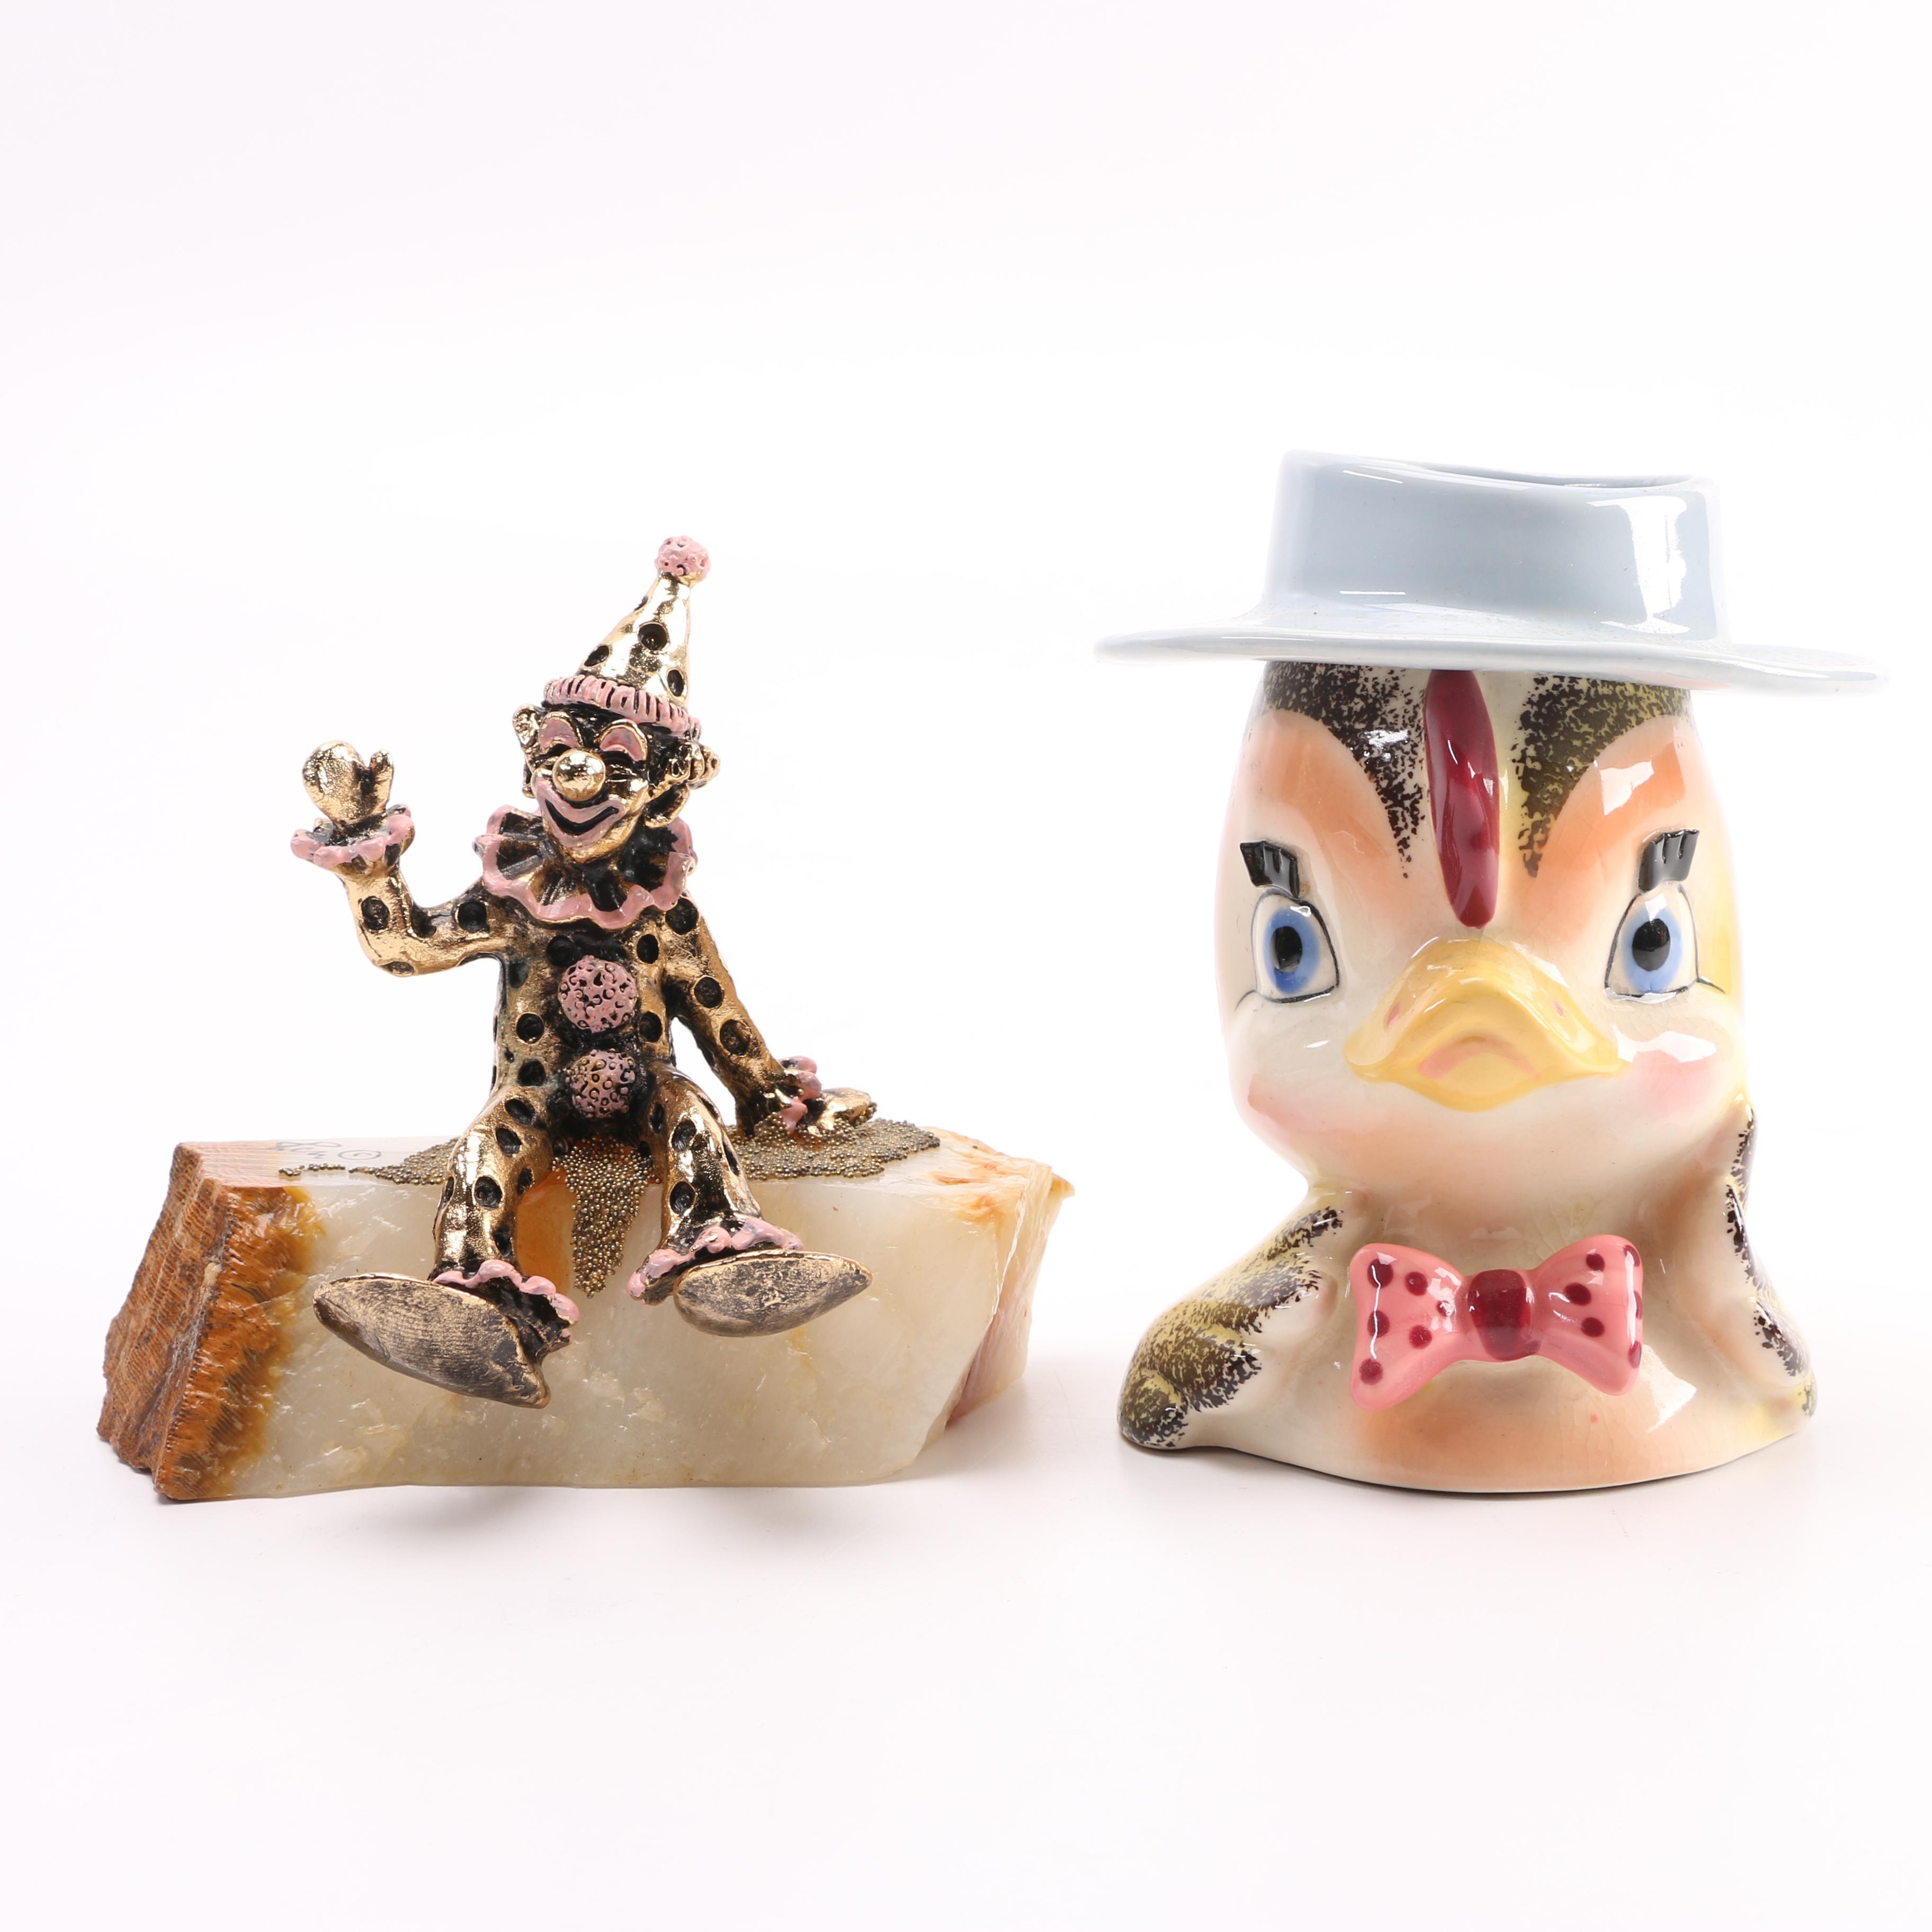 Cast Metal Clown Figurine and Duck Vase